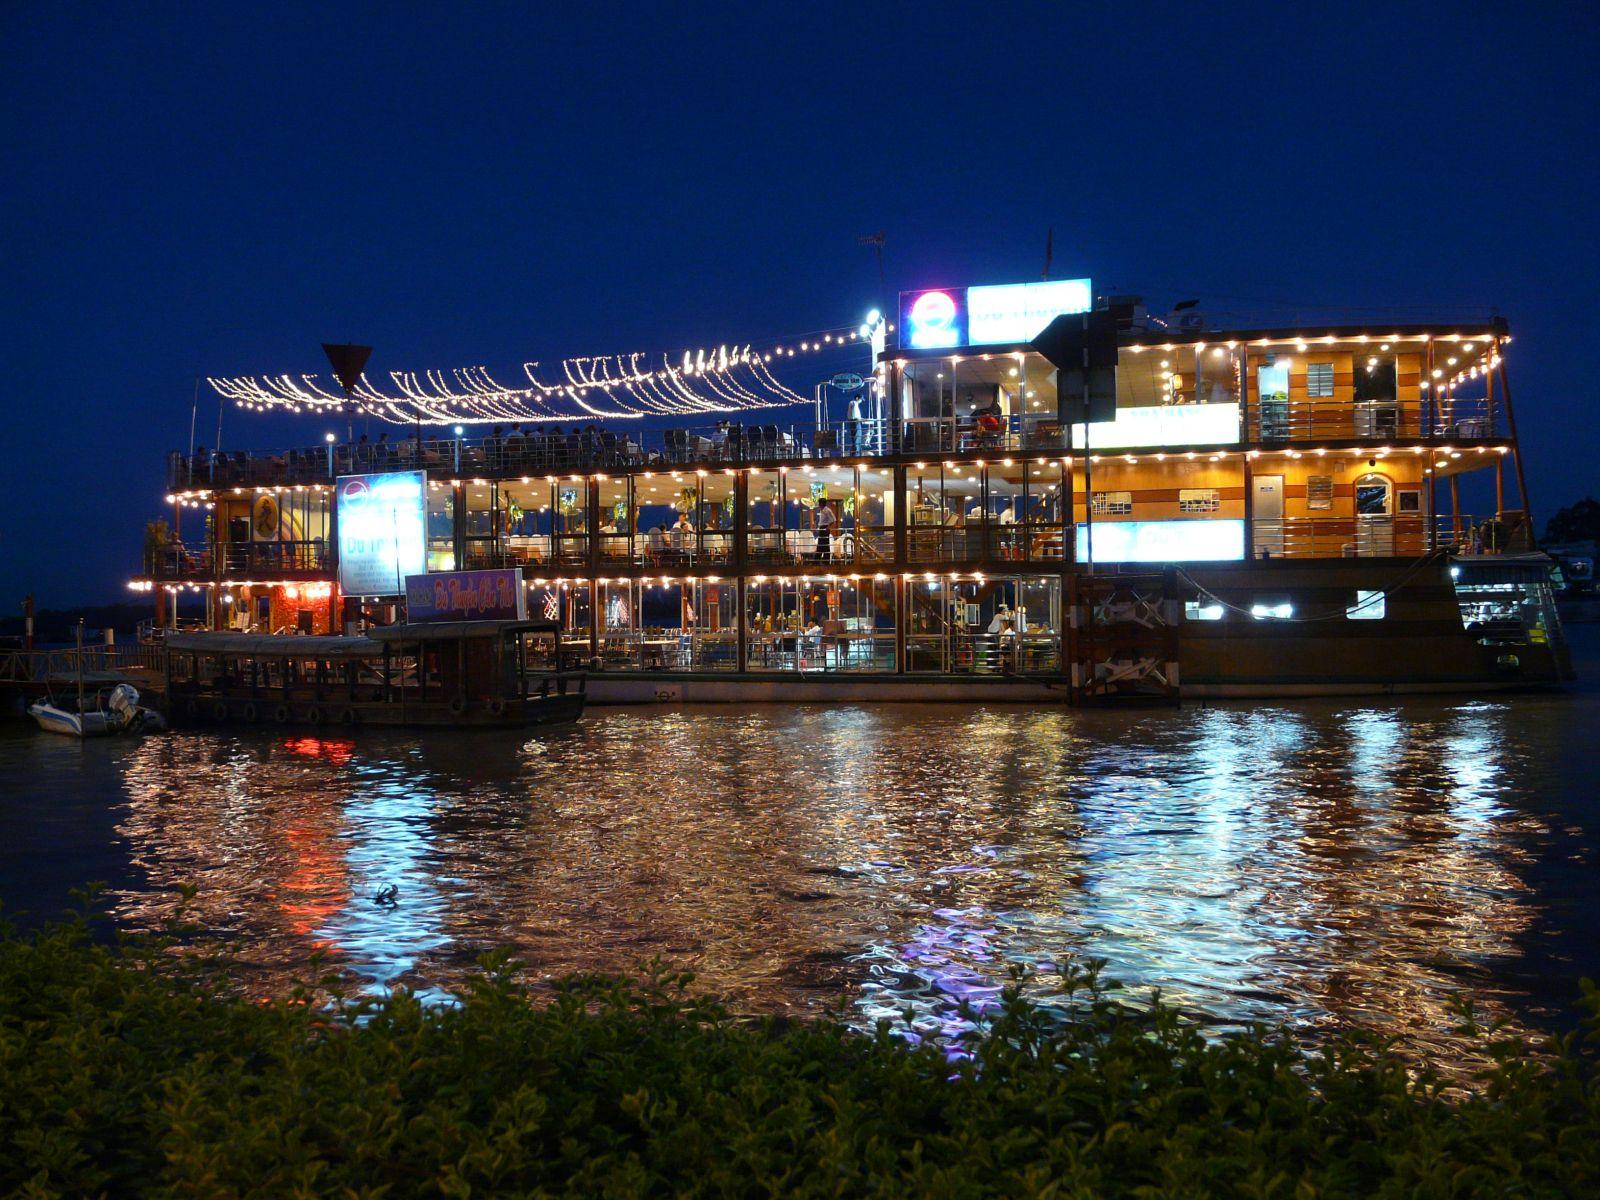 Yacht on Hau river at night